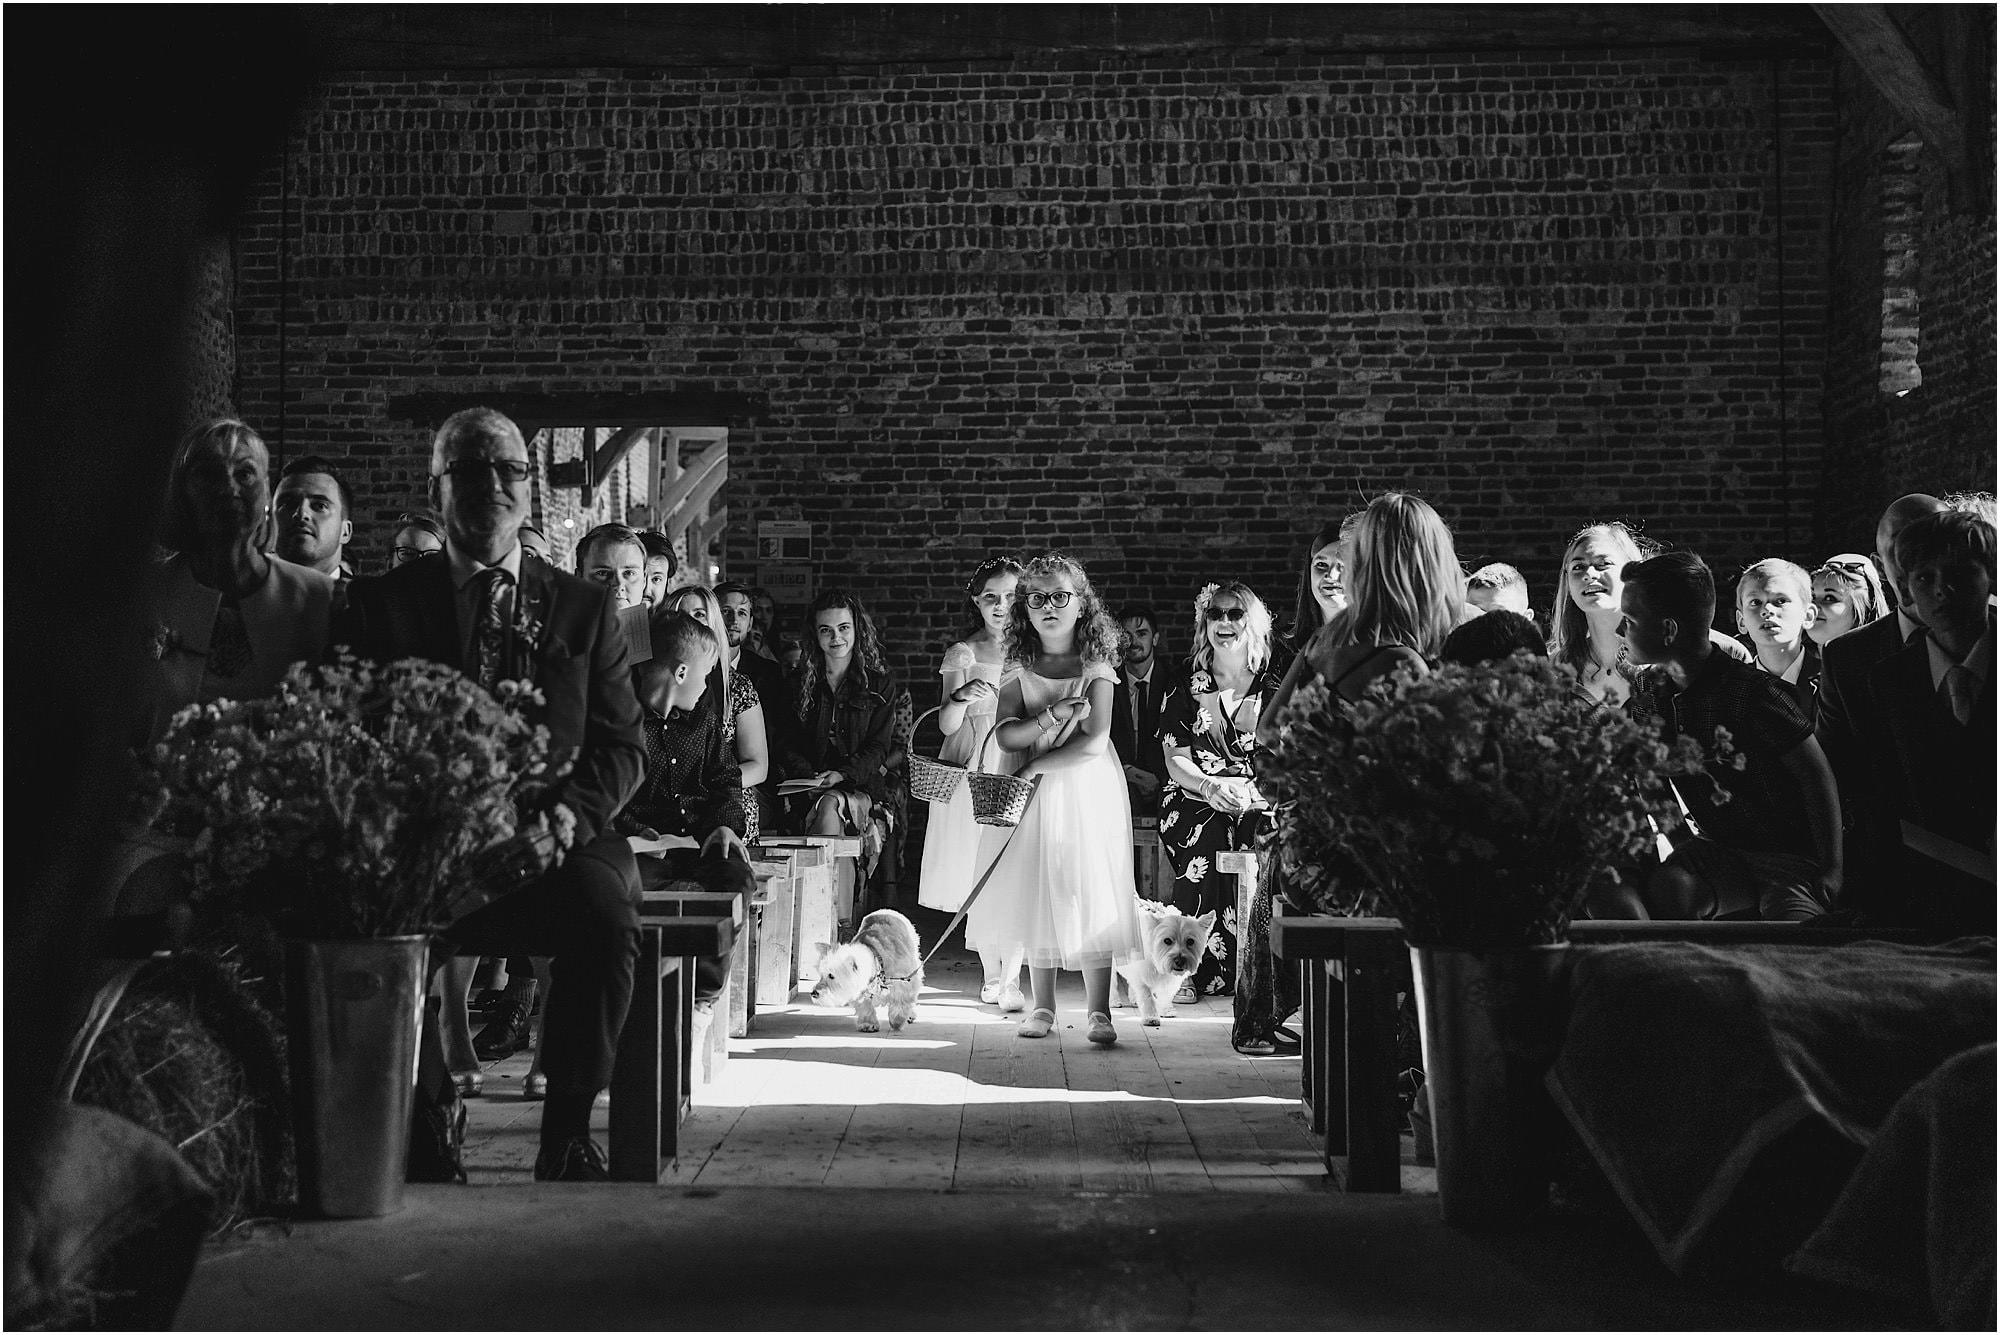 flower girls and Westies walking down the aisle at Waxham Barn